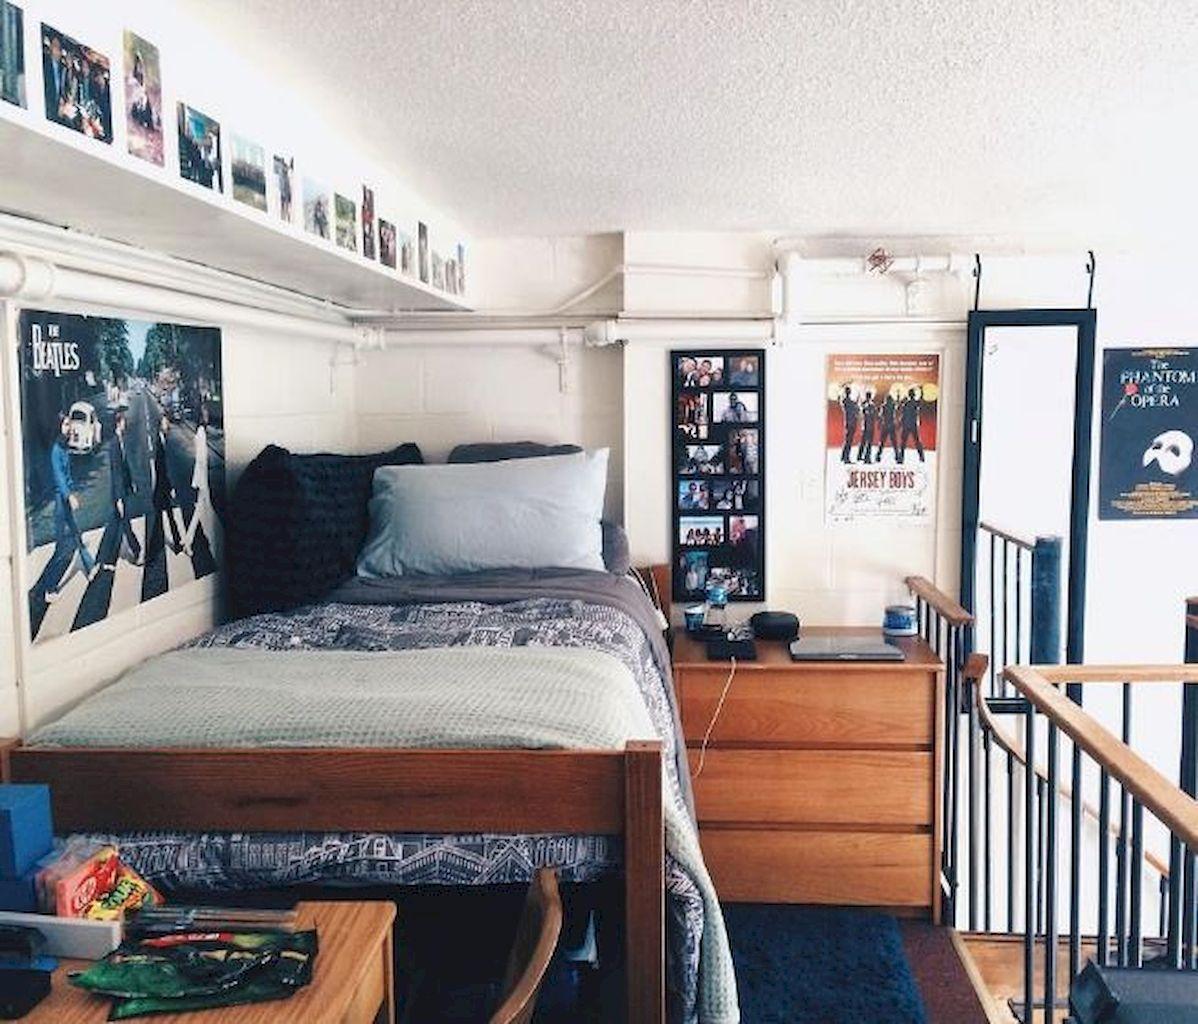 House Cute diy dorm room decorating